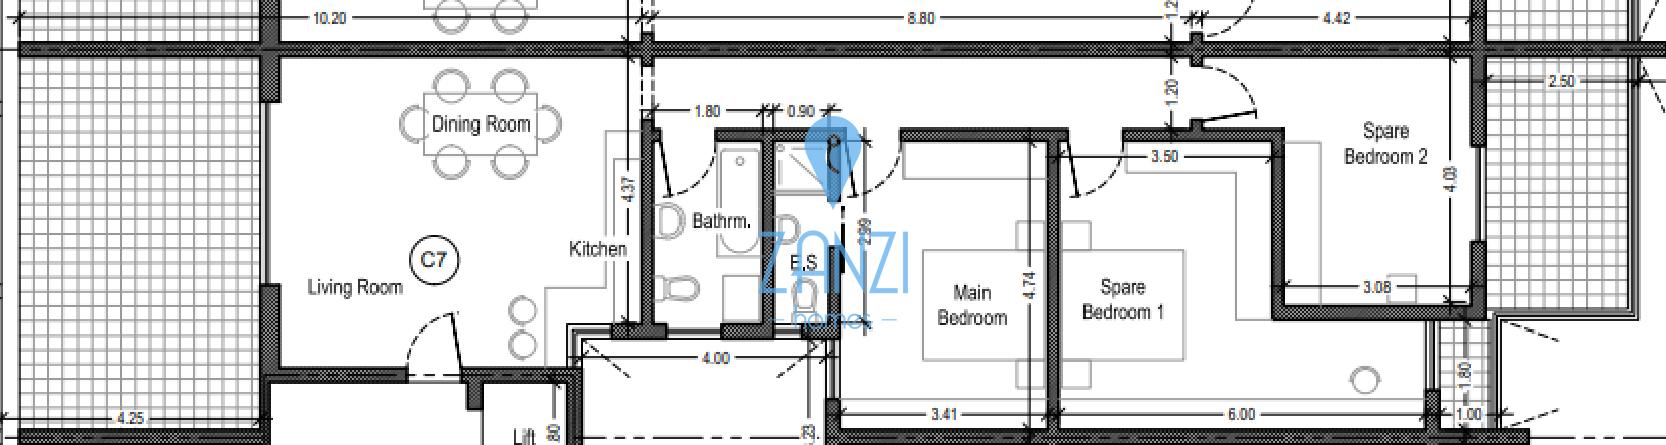 Qormi – 3 Bedroom Penthouse For Sale